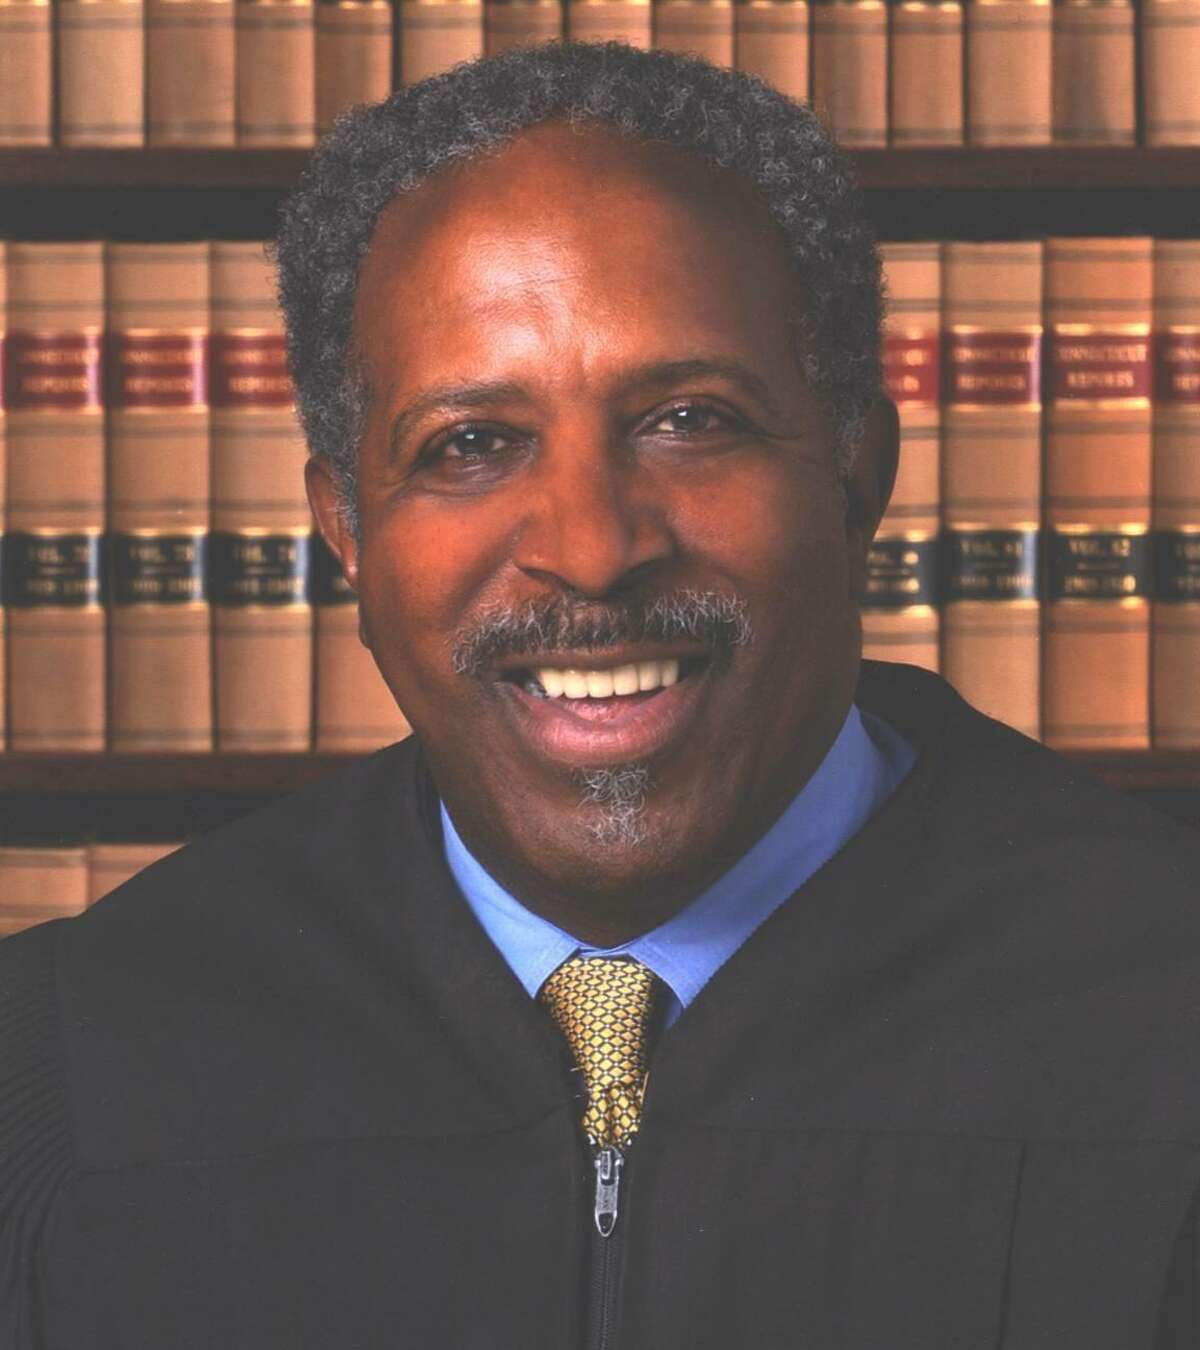 Judge Lubbie Harper Jr. (Journal Register News Service)